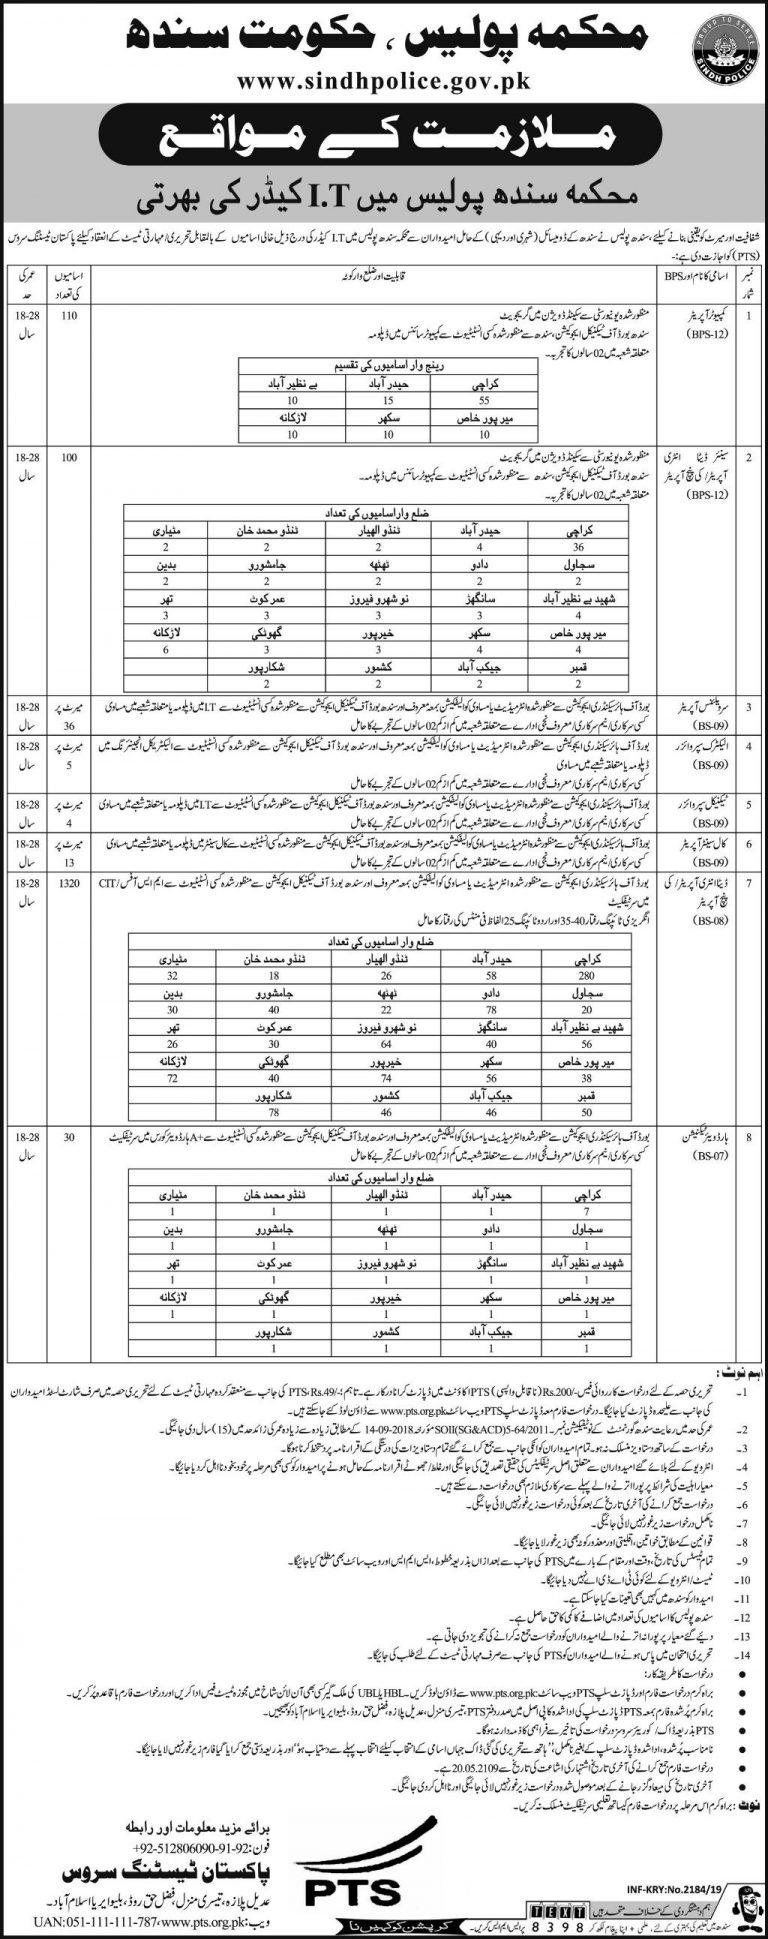 Sindh Police Jobs 2019 Karachi PTS Application Form Download Latest